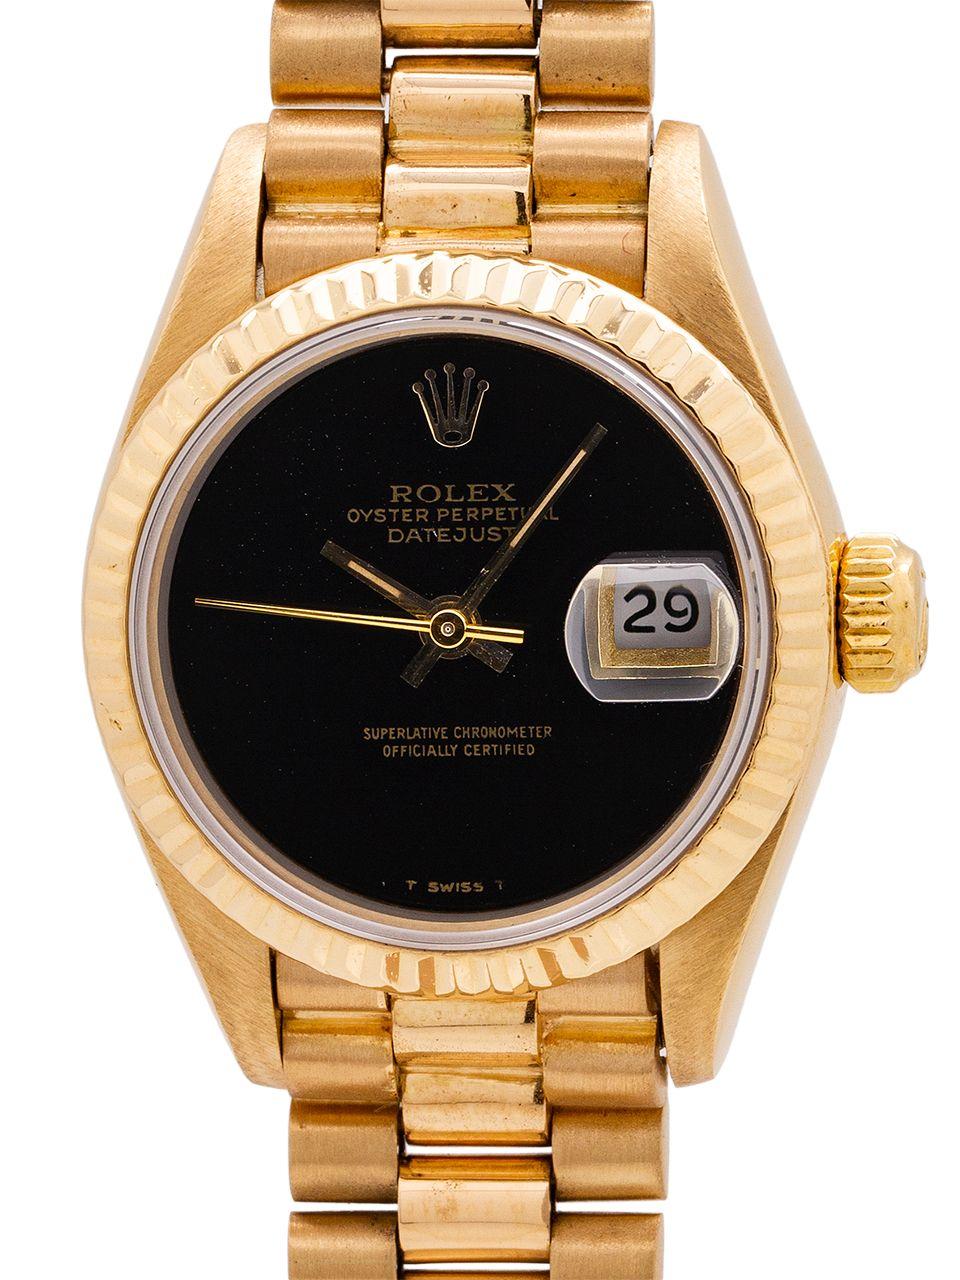 Rolex Lady Datejust President 18k Yg Ref 69178 Onyx Dial Circa 1985 Rolex Women Rolex Rolex Logo